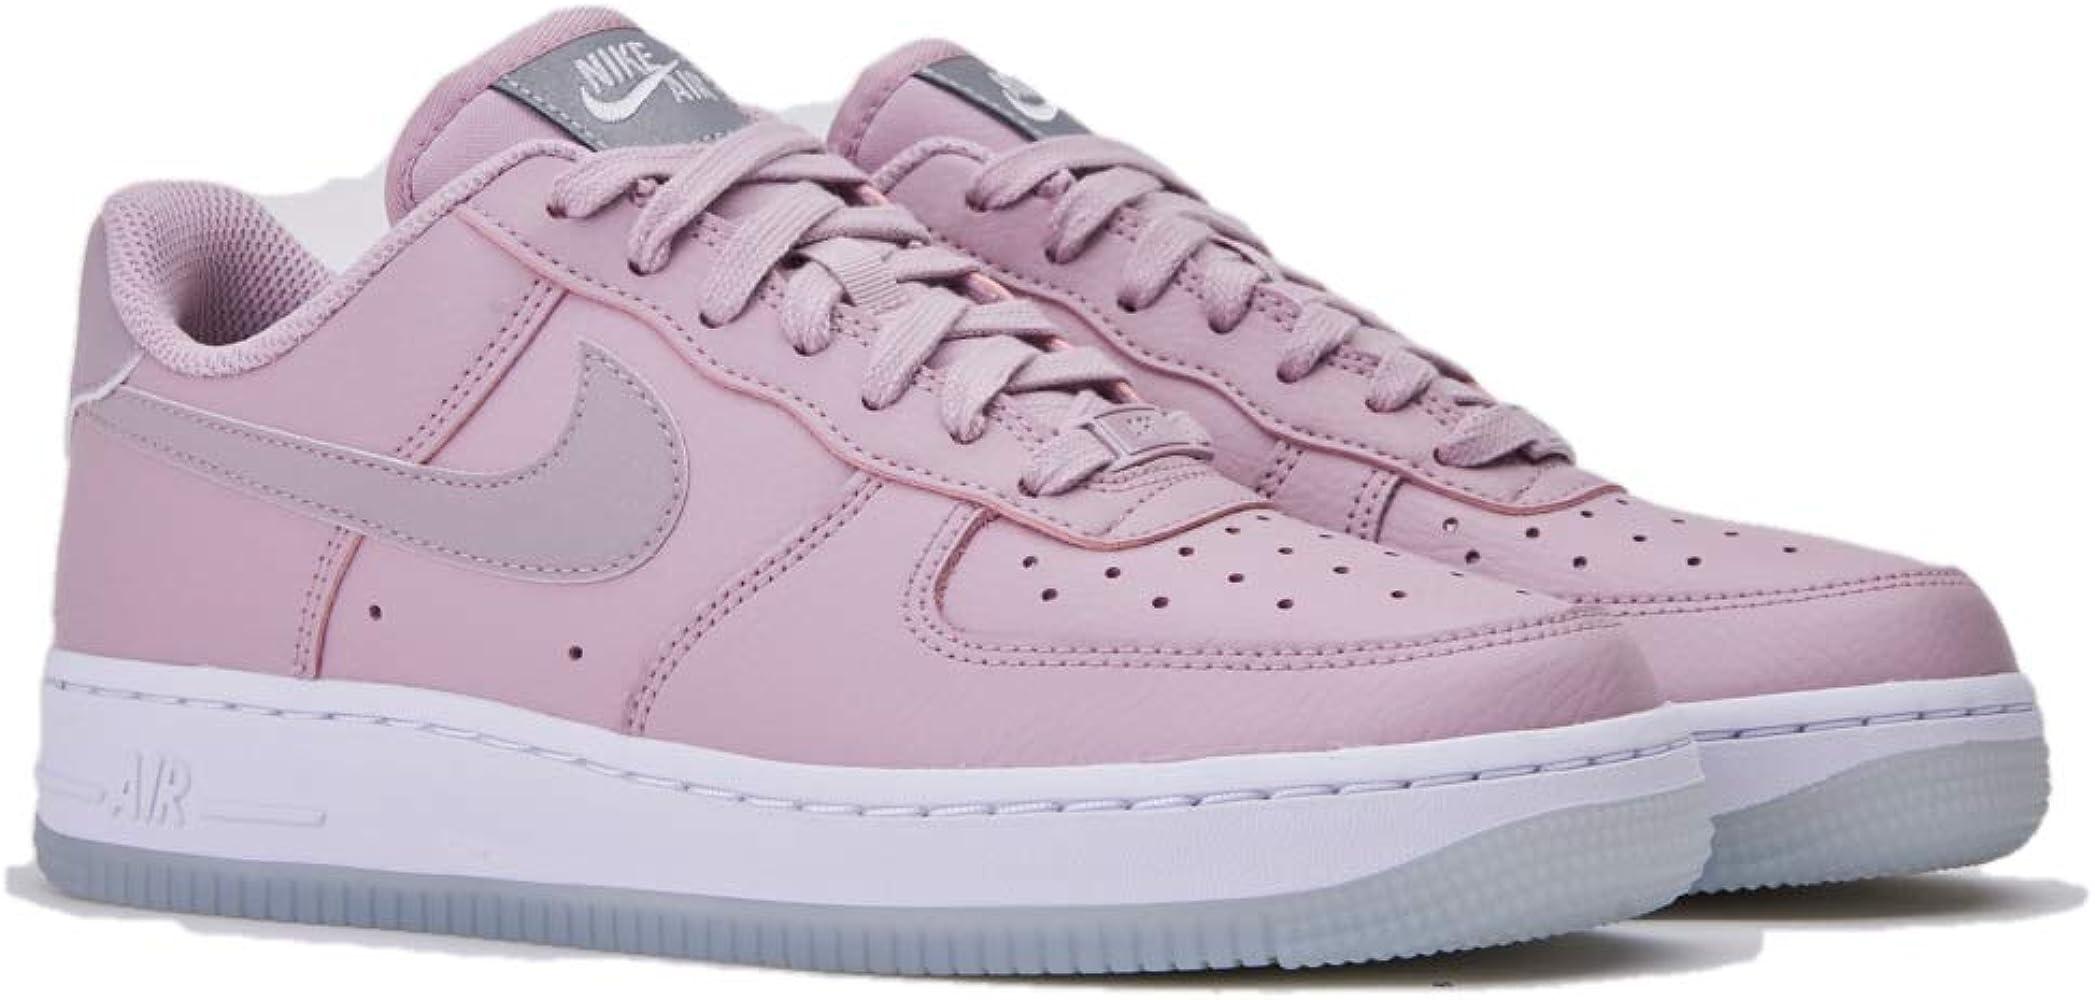 Nike Wmns Air Force 1 07 ESS, Zapatos de Baloncesto para Mujer ...